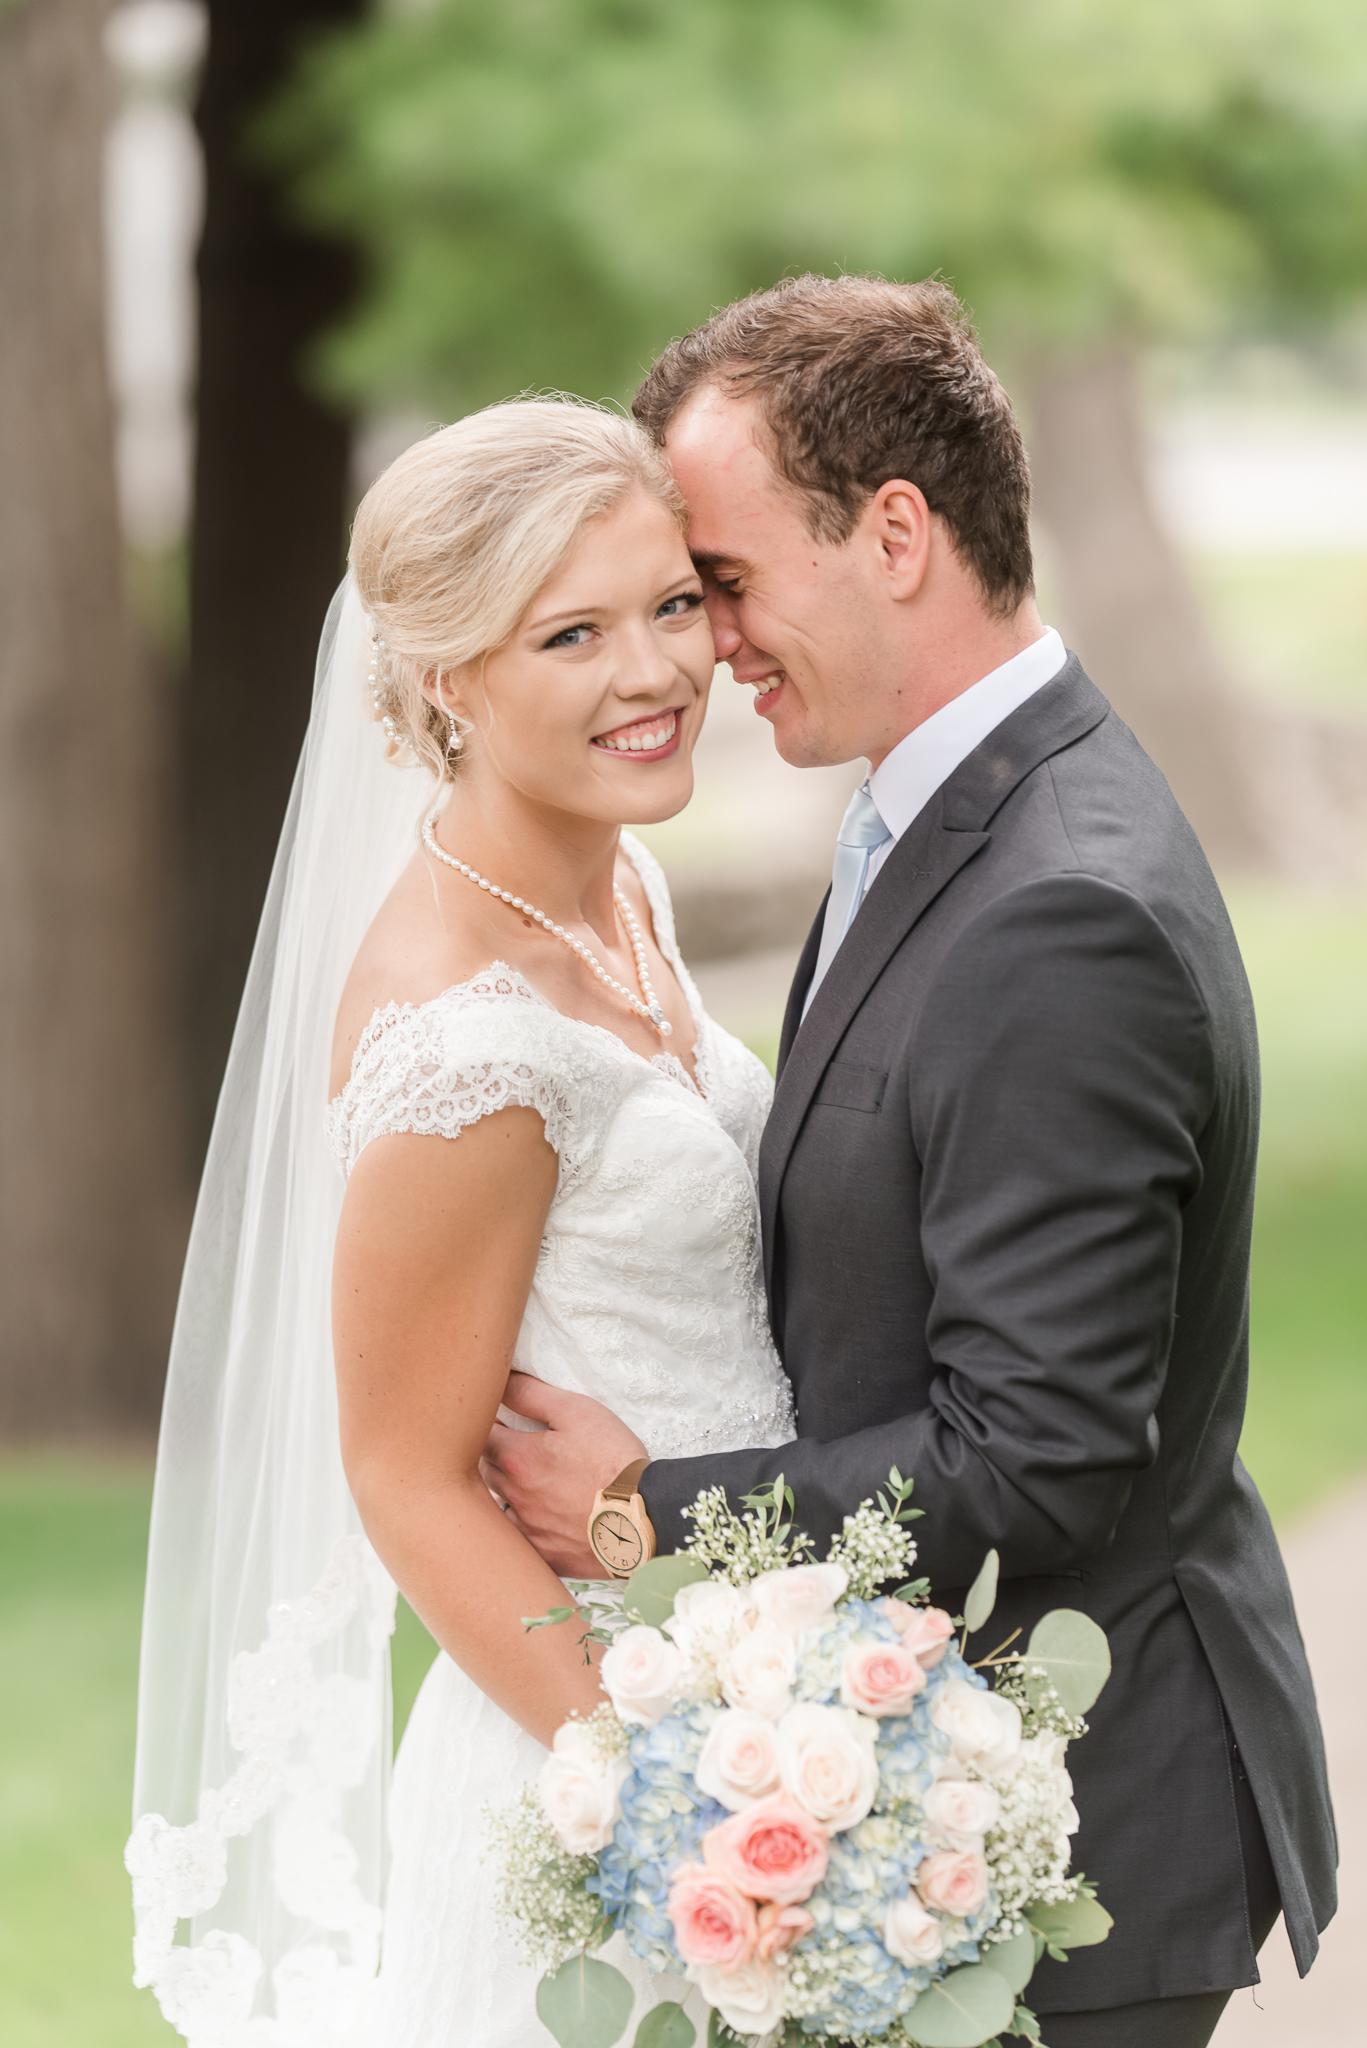 Westminister Hall Wedding Winona Lake Indiana8499.jpg